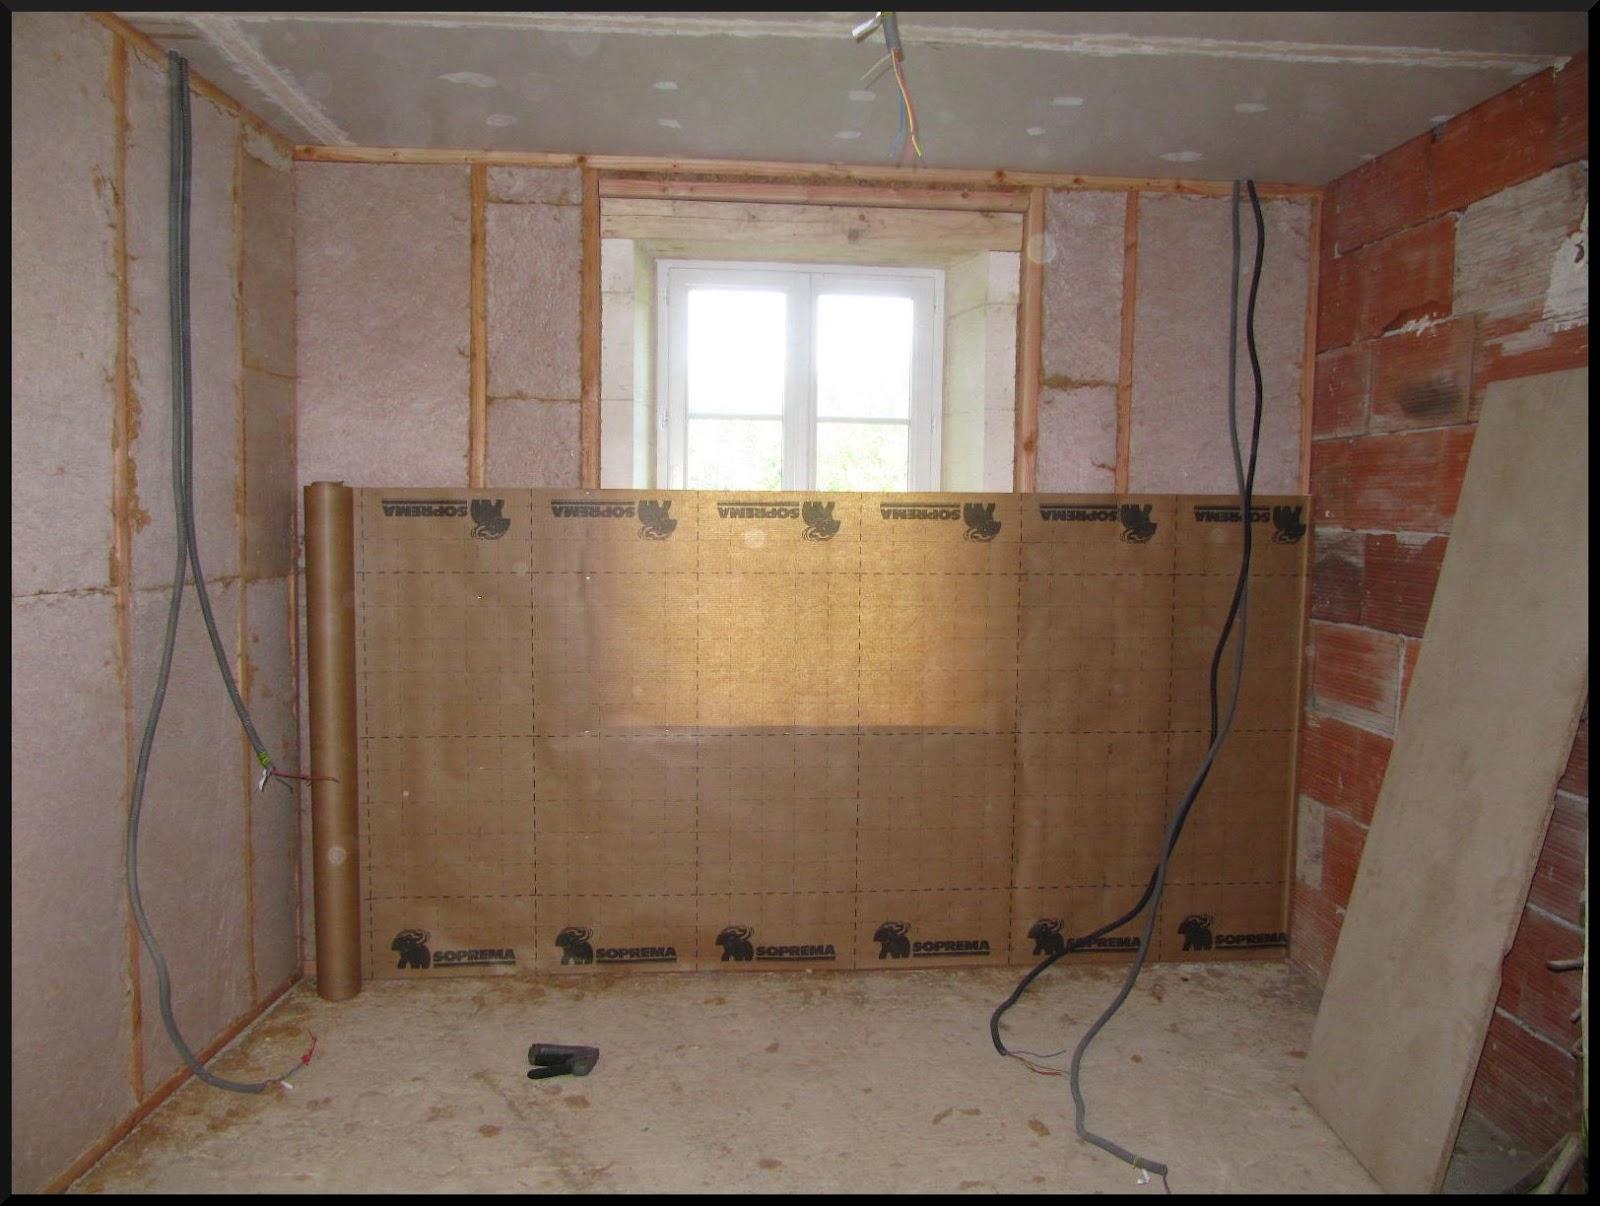 isolation sonore plafond sous sol simulation prix construction maison guyane soci t gfgjuq. Black Bedroom Furniture Sets. Home Design Ideas